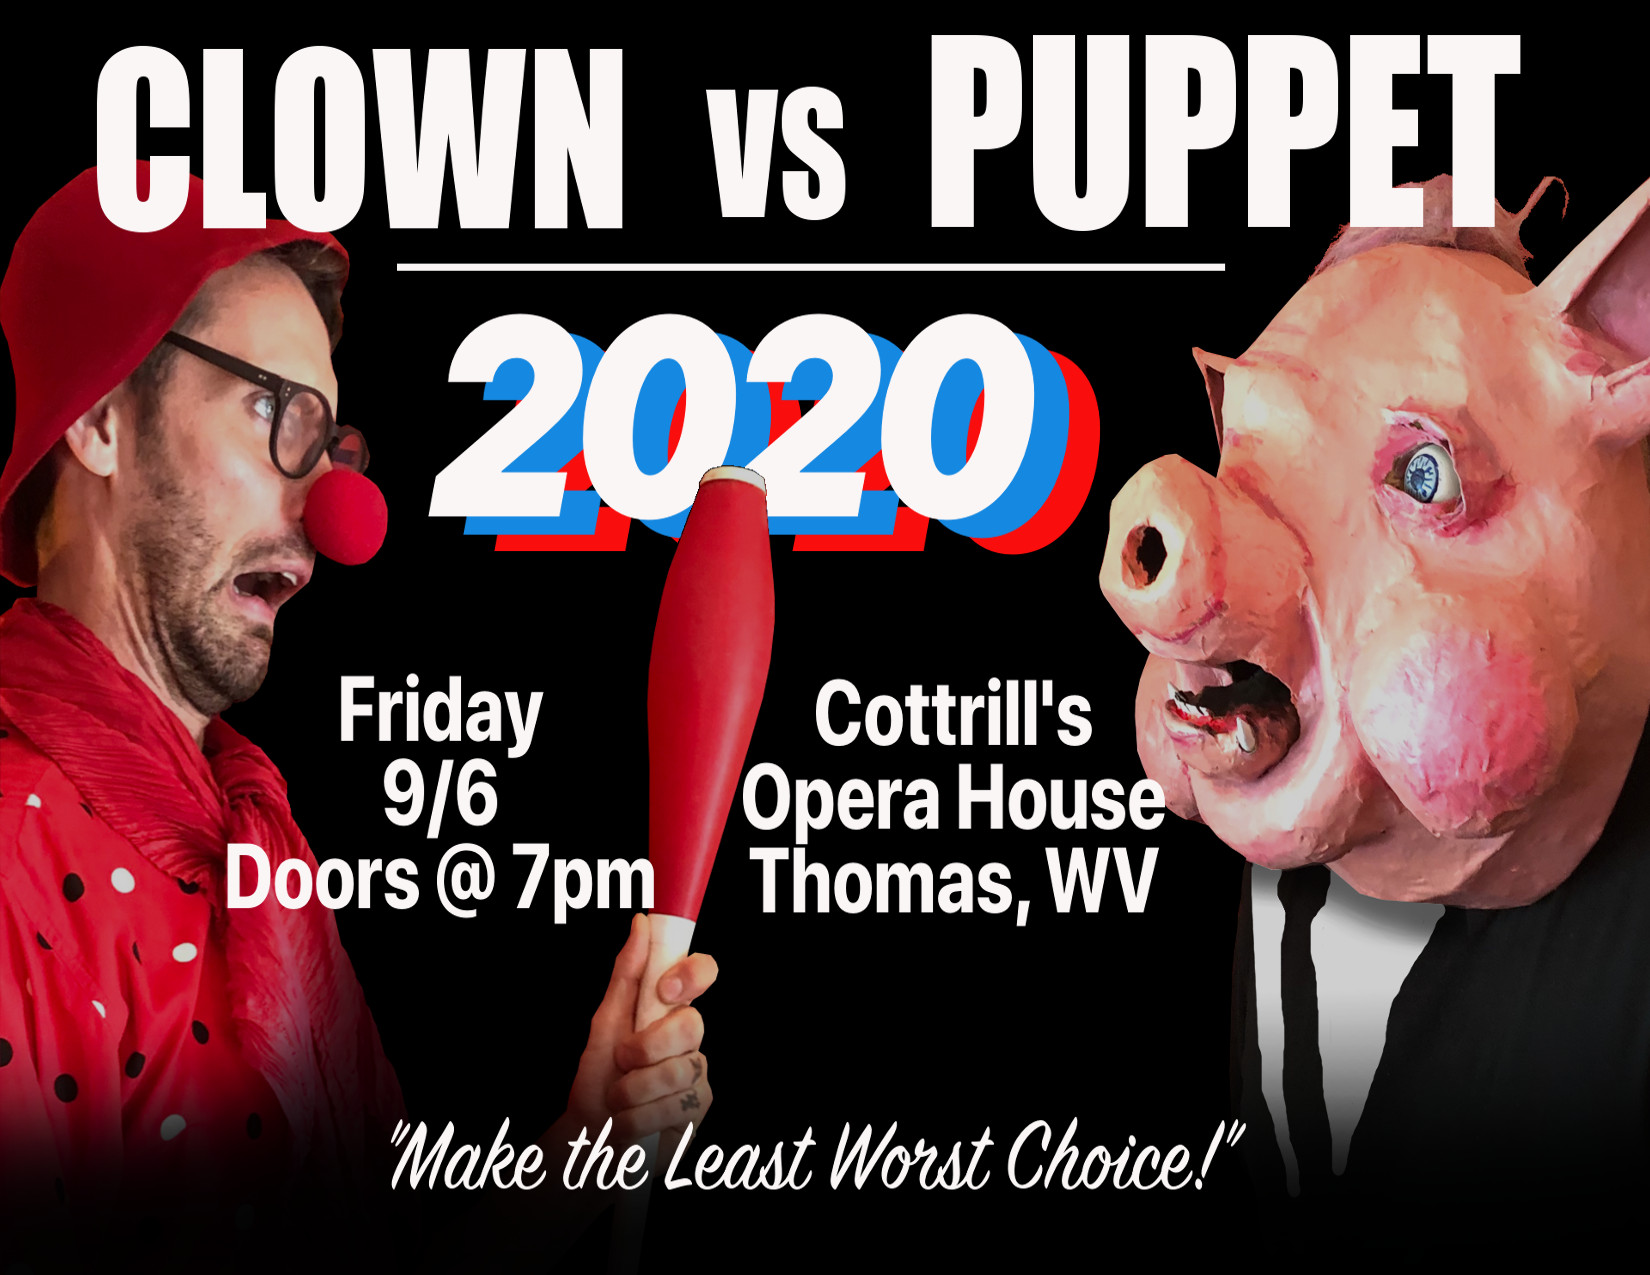 clown vs puppet thomas.jpg